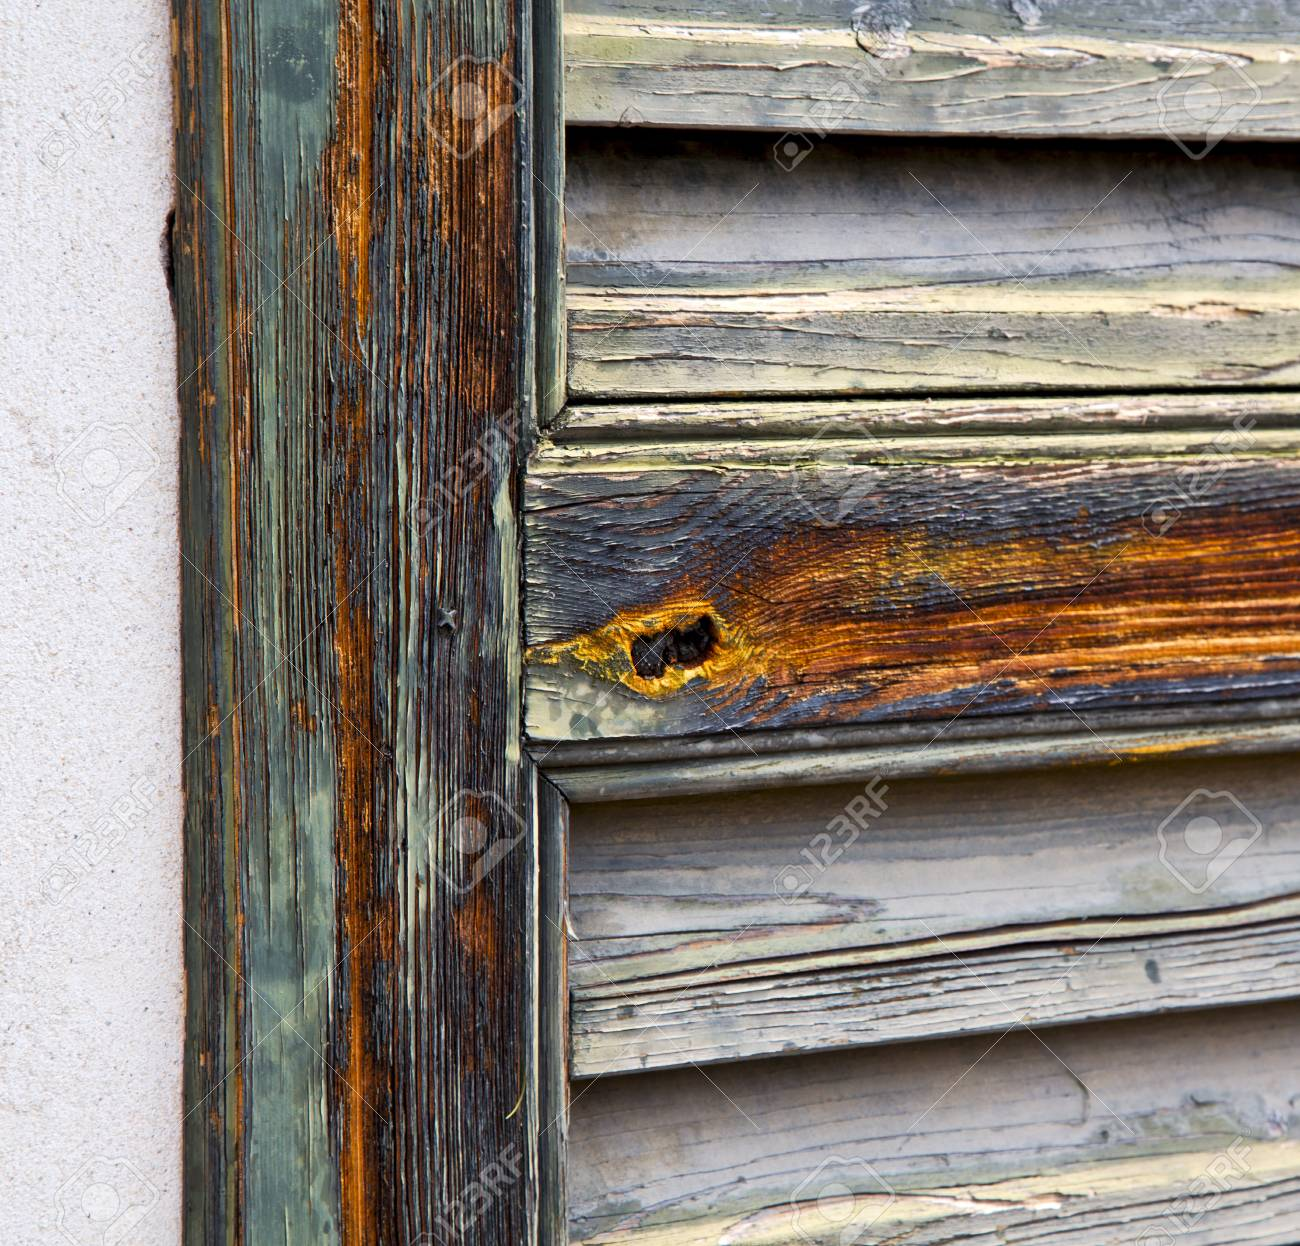 Fenster Varese Palaste Italien Abstrakte Holz Jalousie Im Beton Ziegel